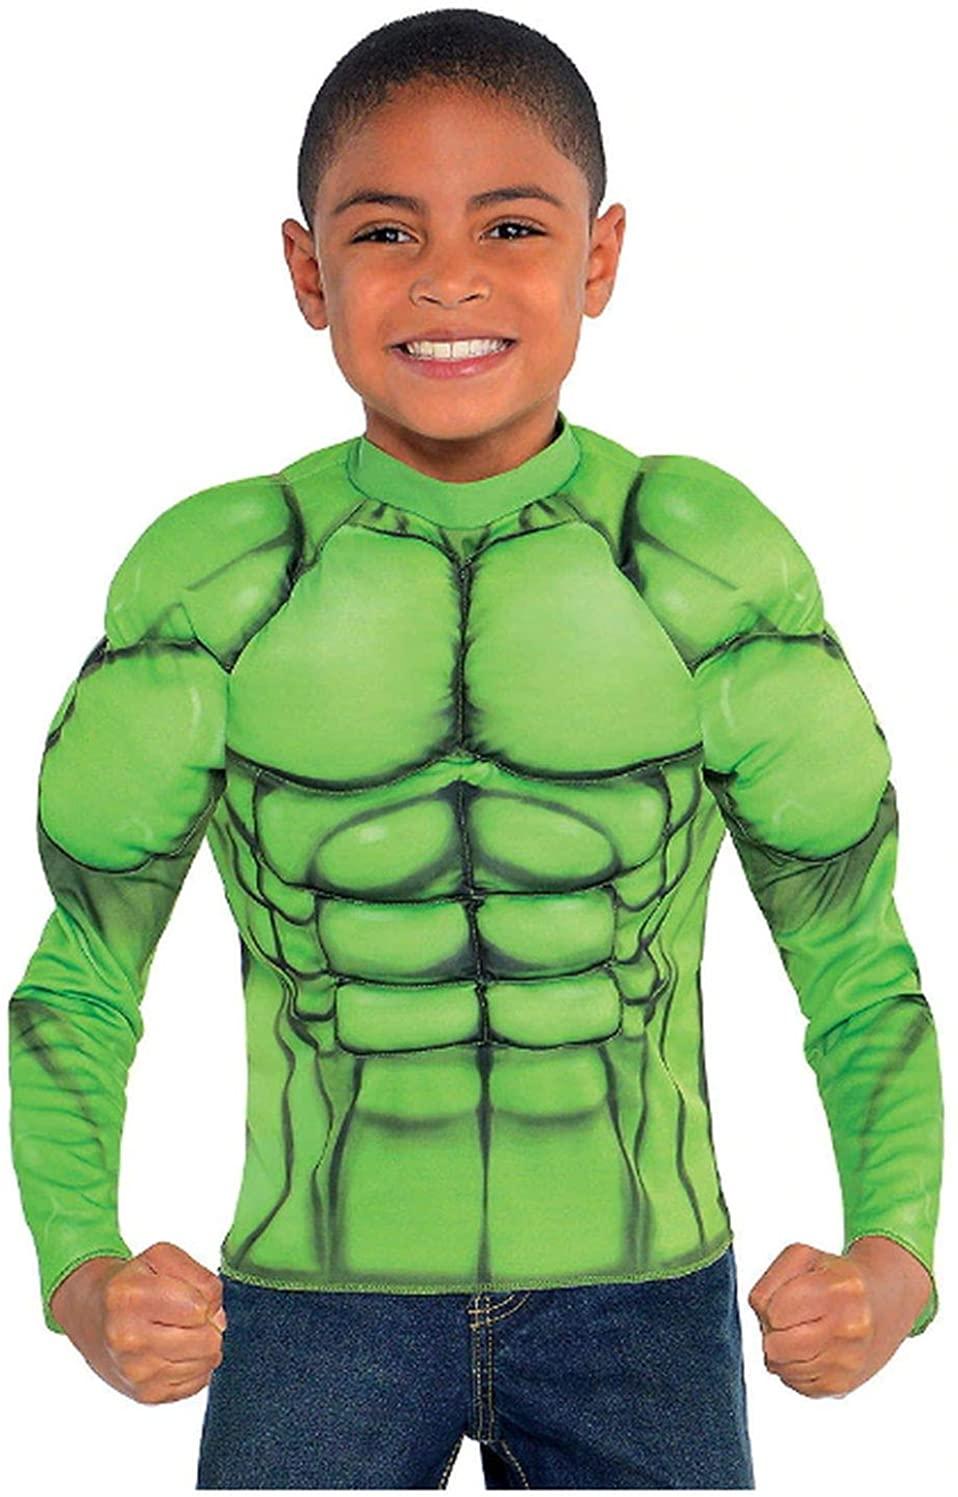 Kids Hulk Muscle Shirt Green